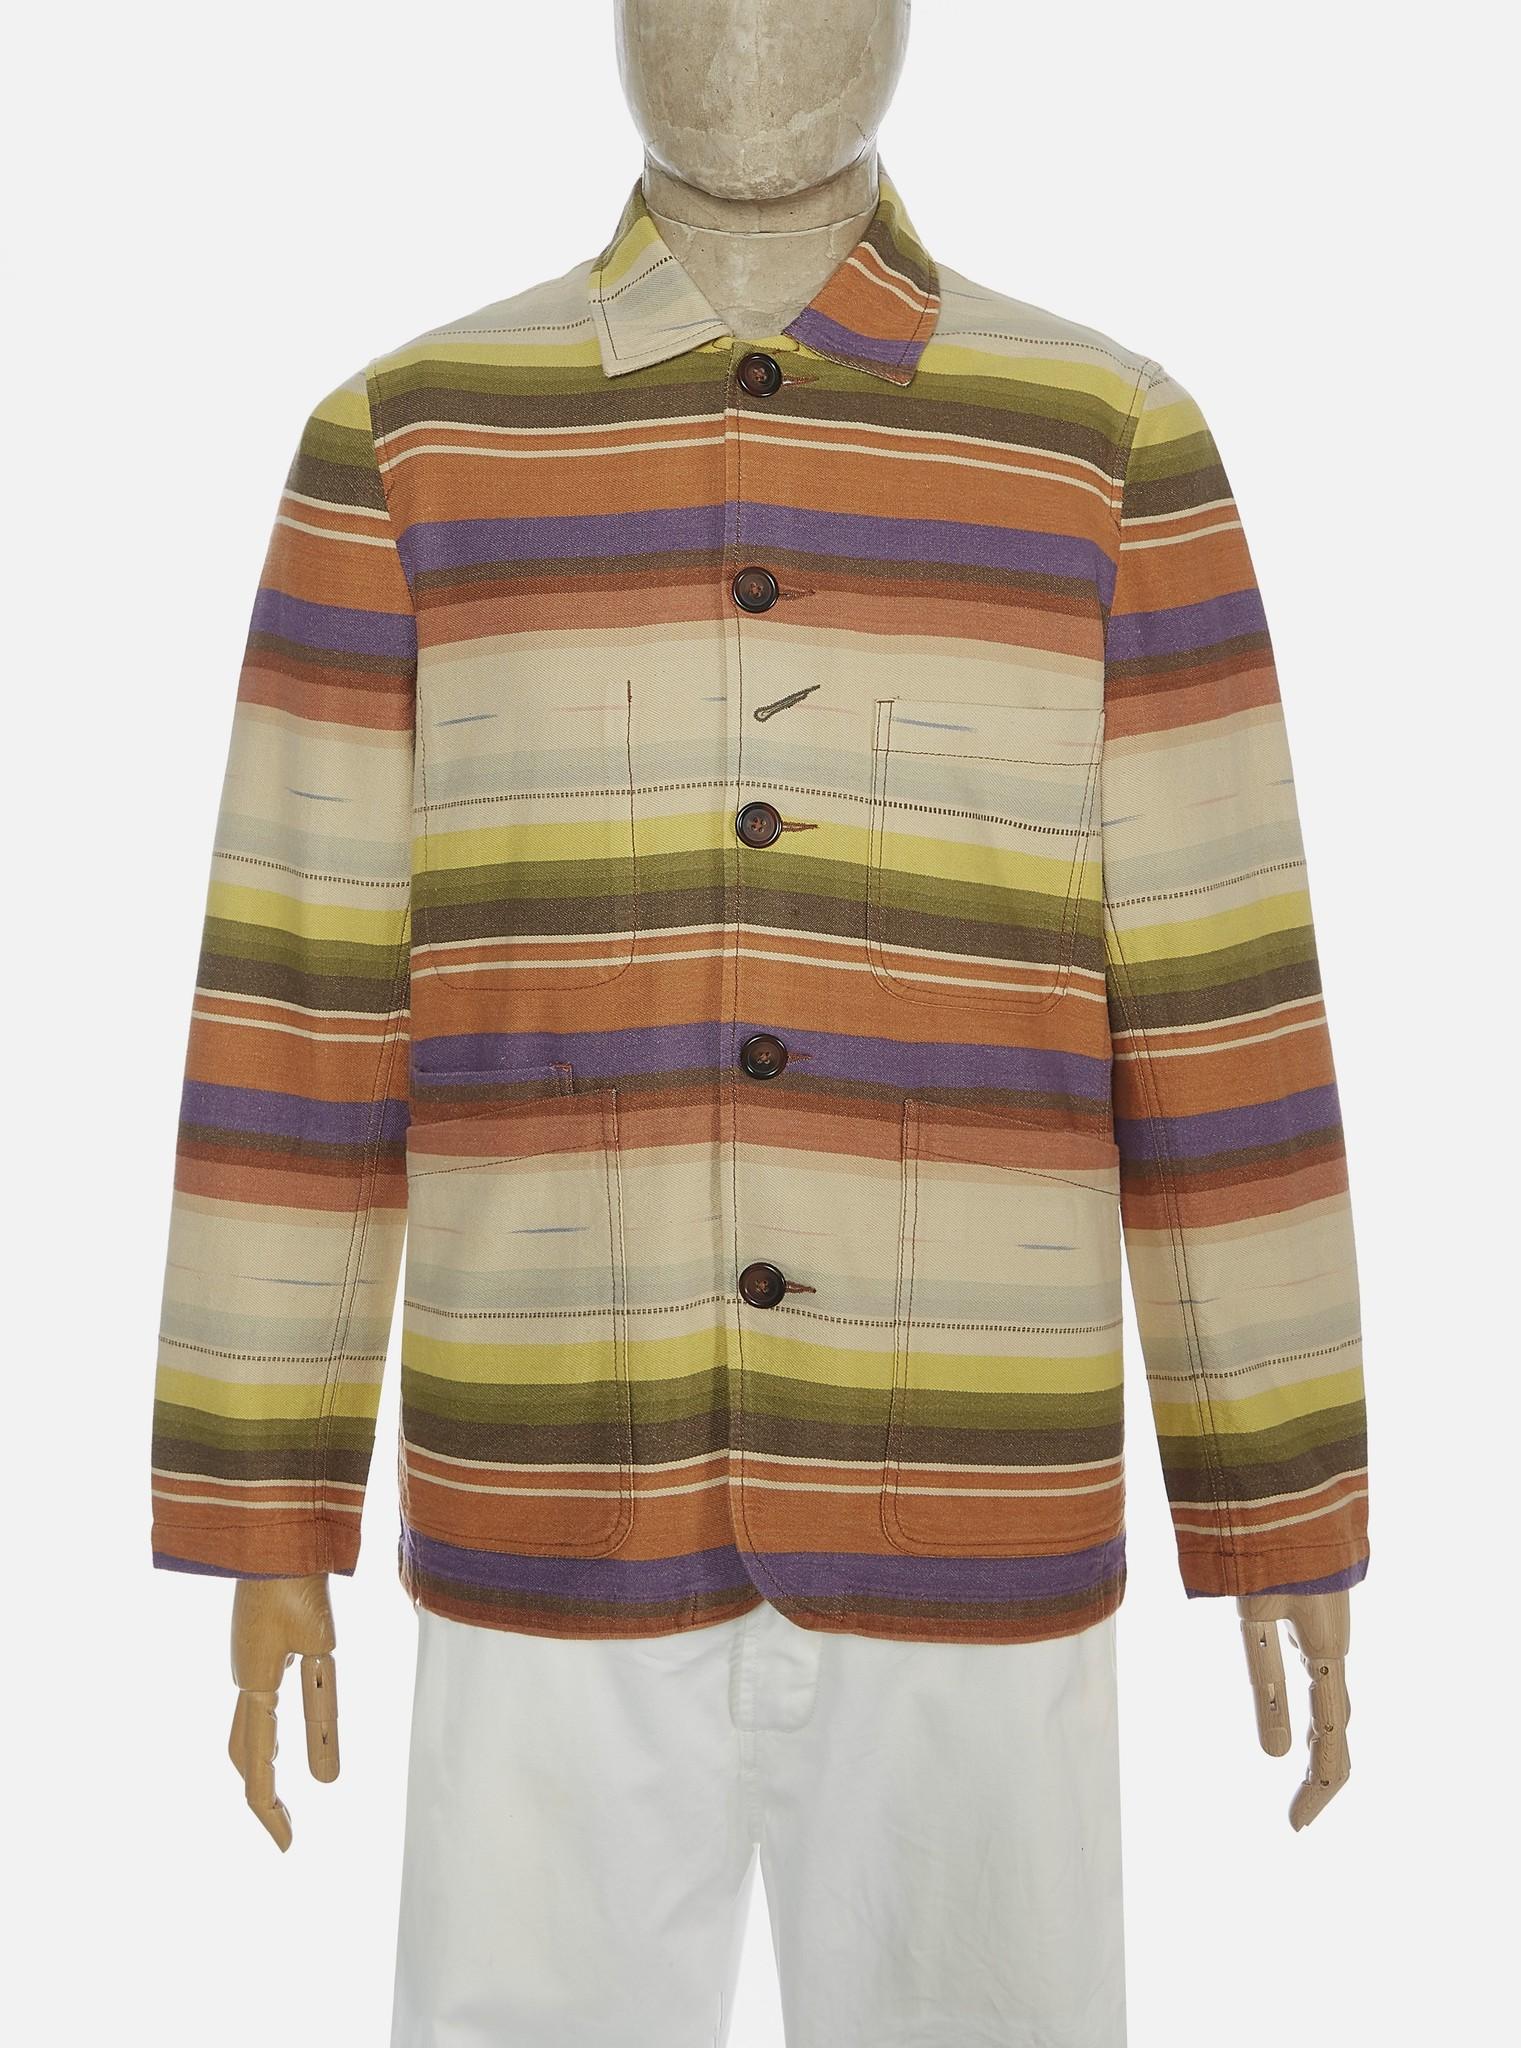 Bakers Jacket multi Stripe Mex Blanket-1